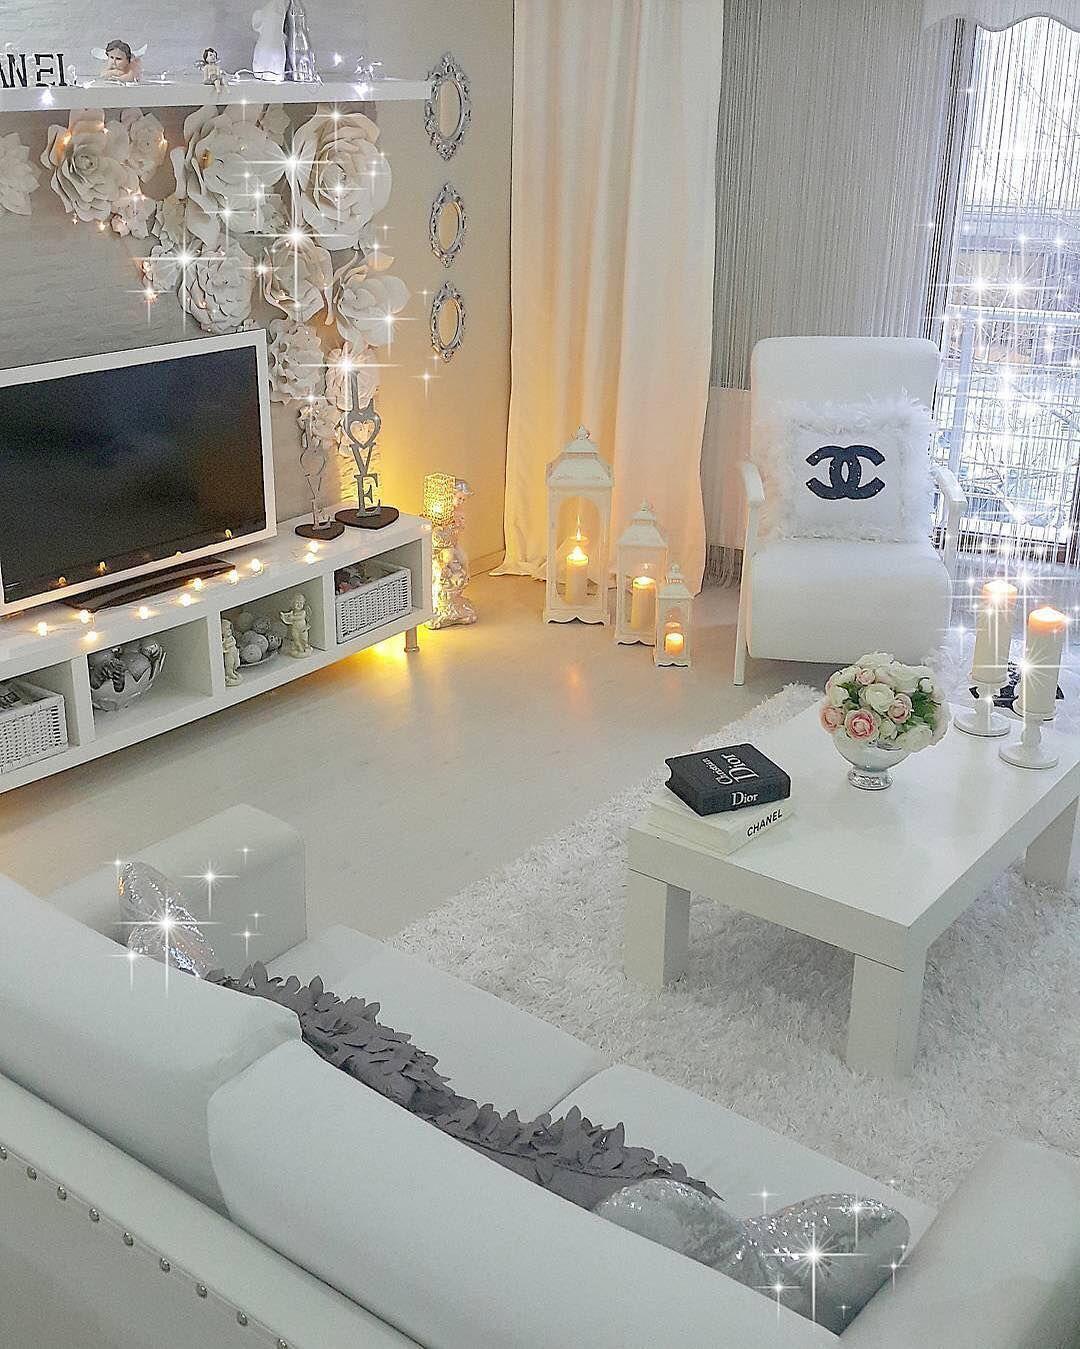 5 455 Likes 87 Comments مجالس مطابخ Decor Decor M M On Instagram تنسيق مميز Filizolmez Home Romantic Living Room Living Room Decor Decor